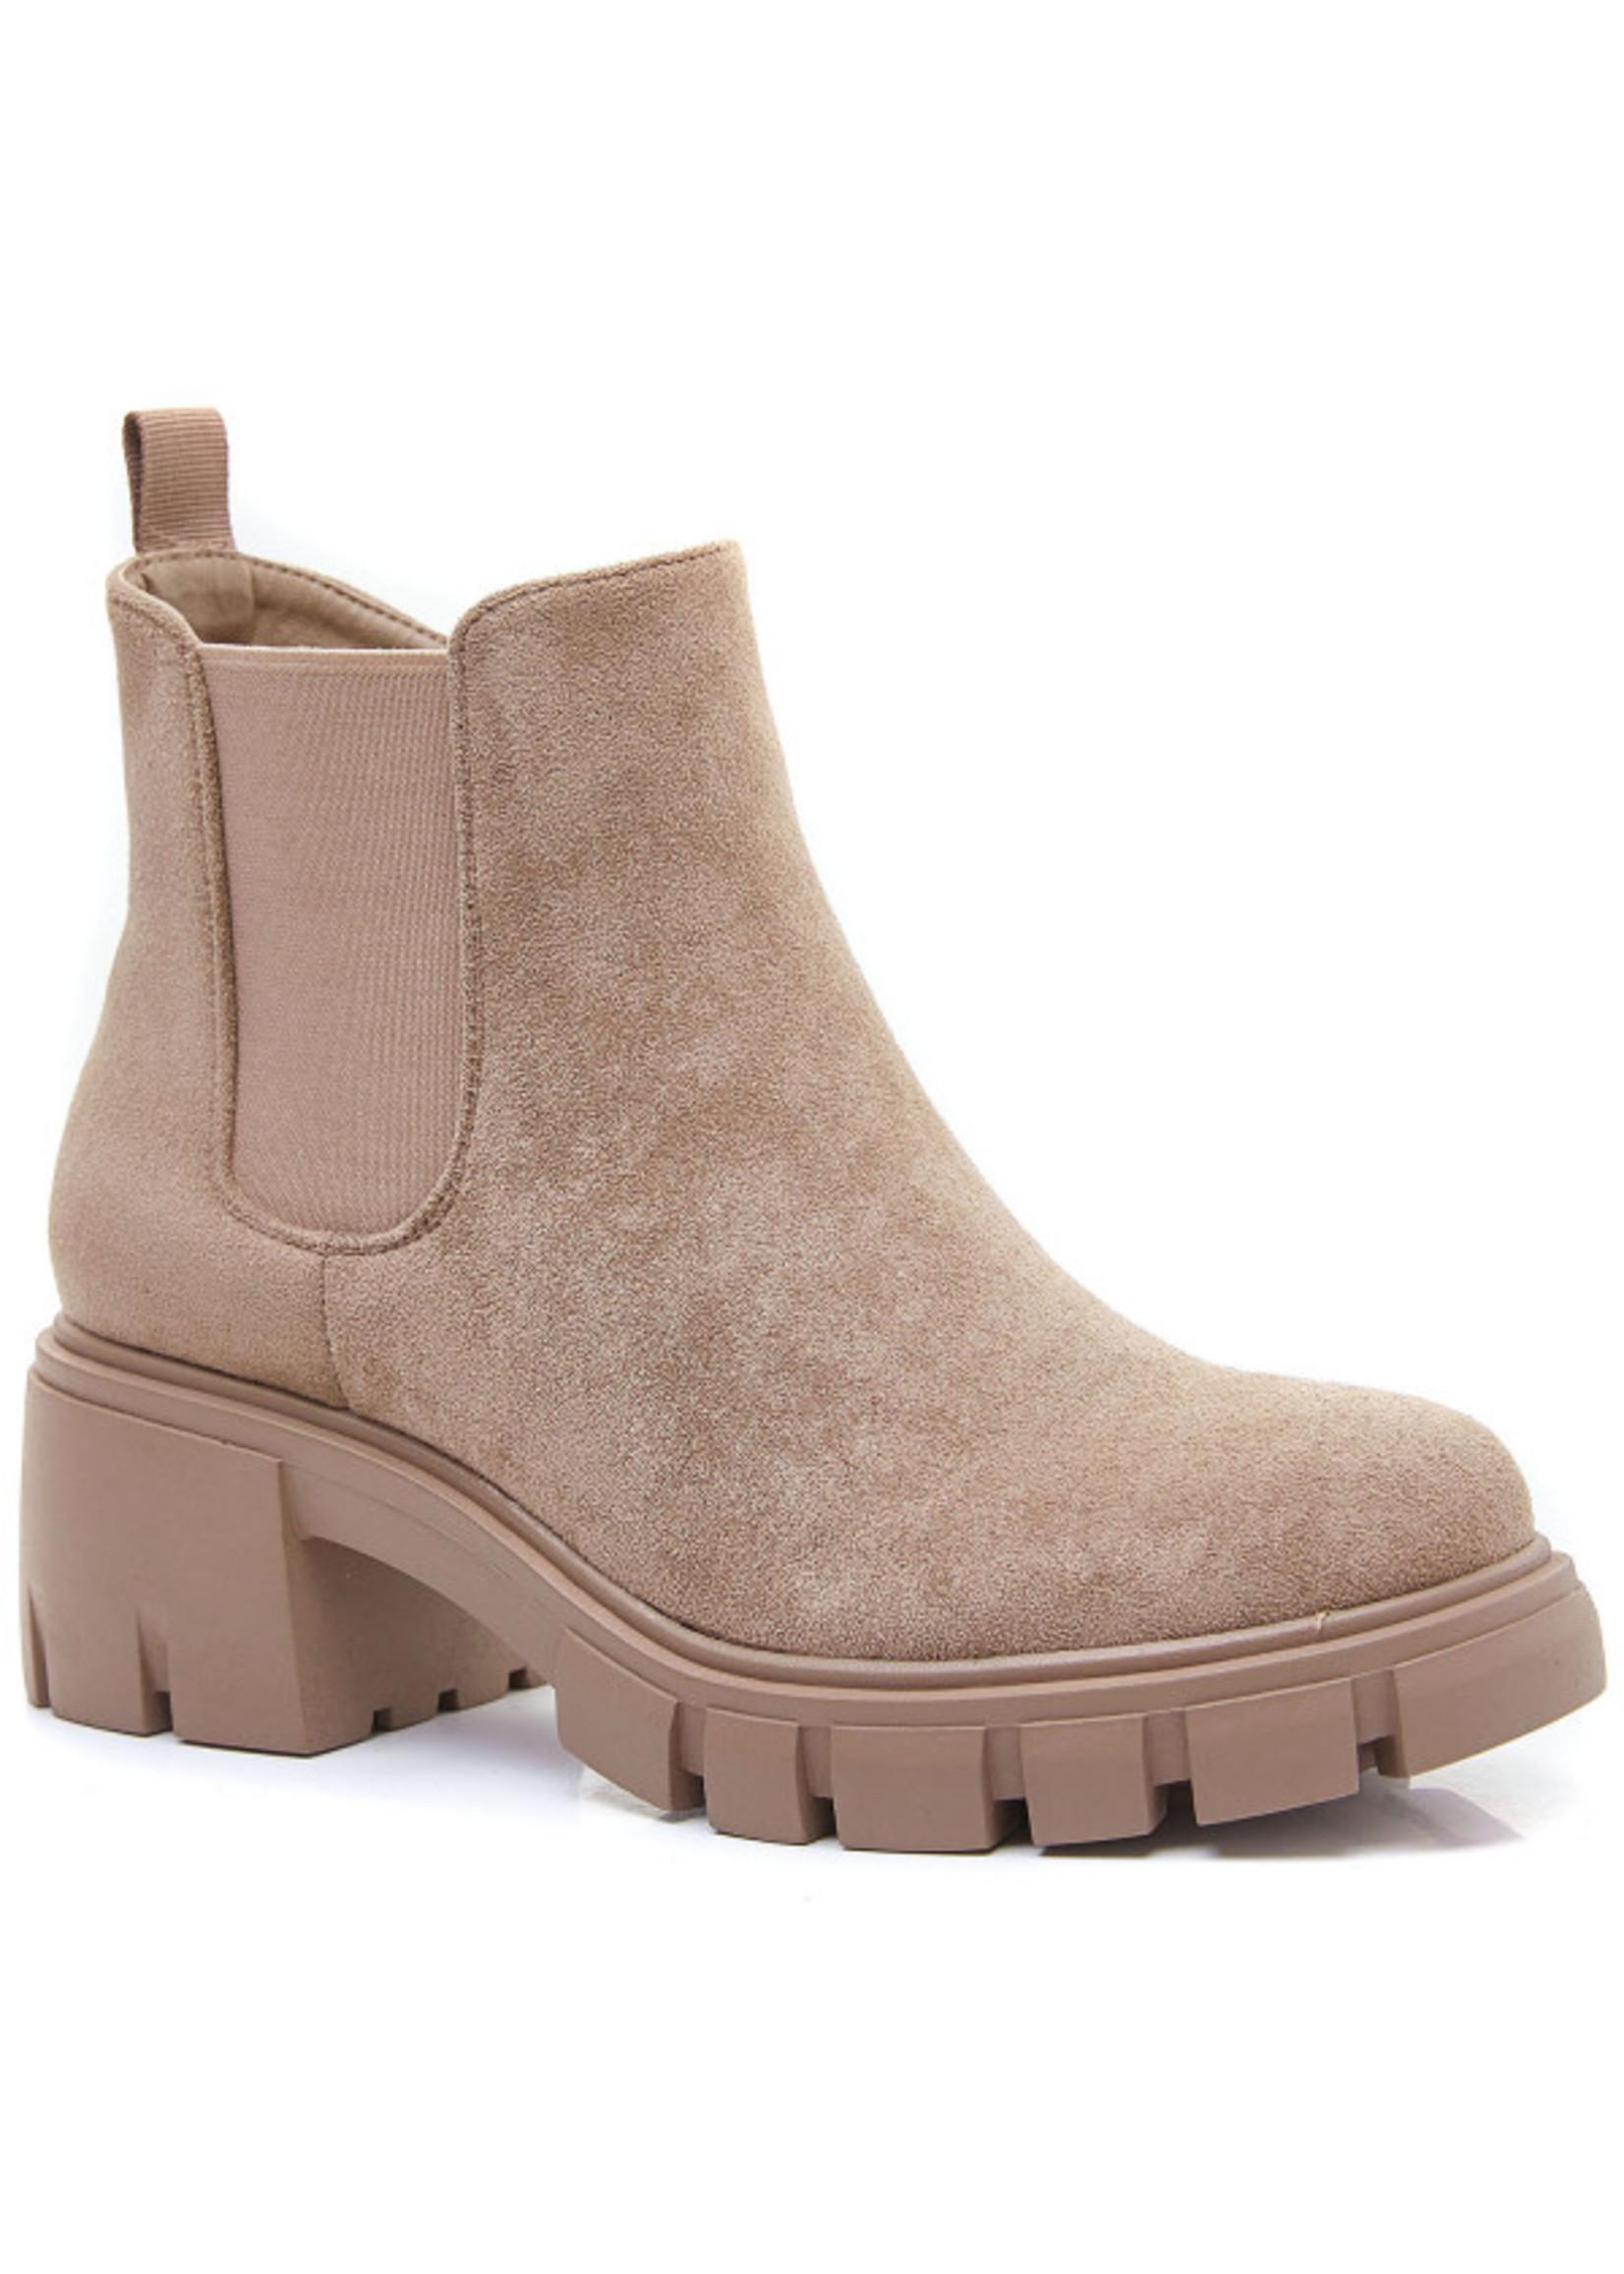 Taupe fashion boot